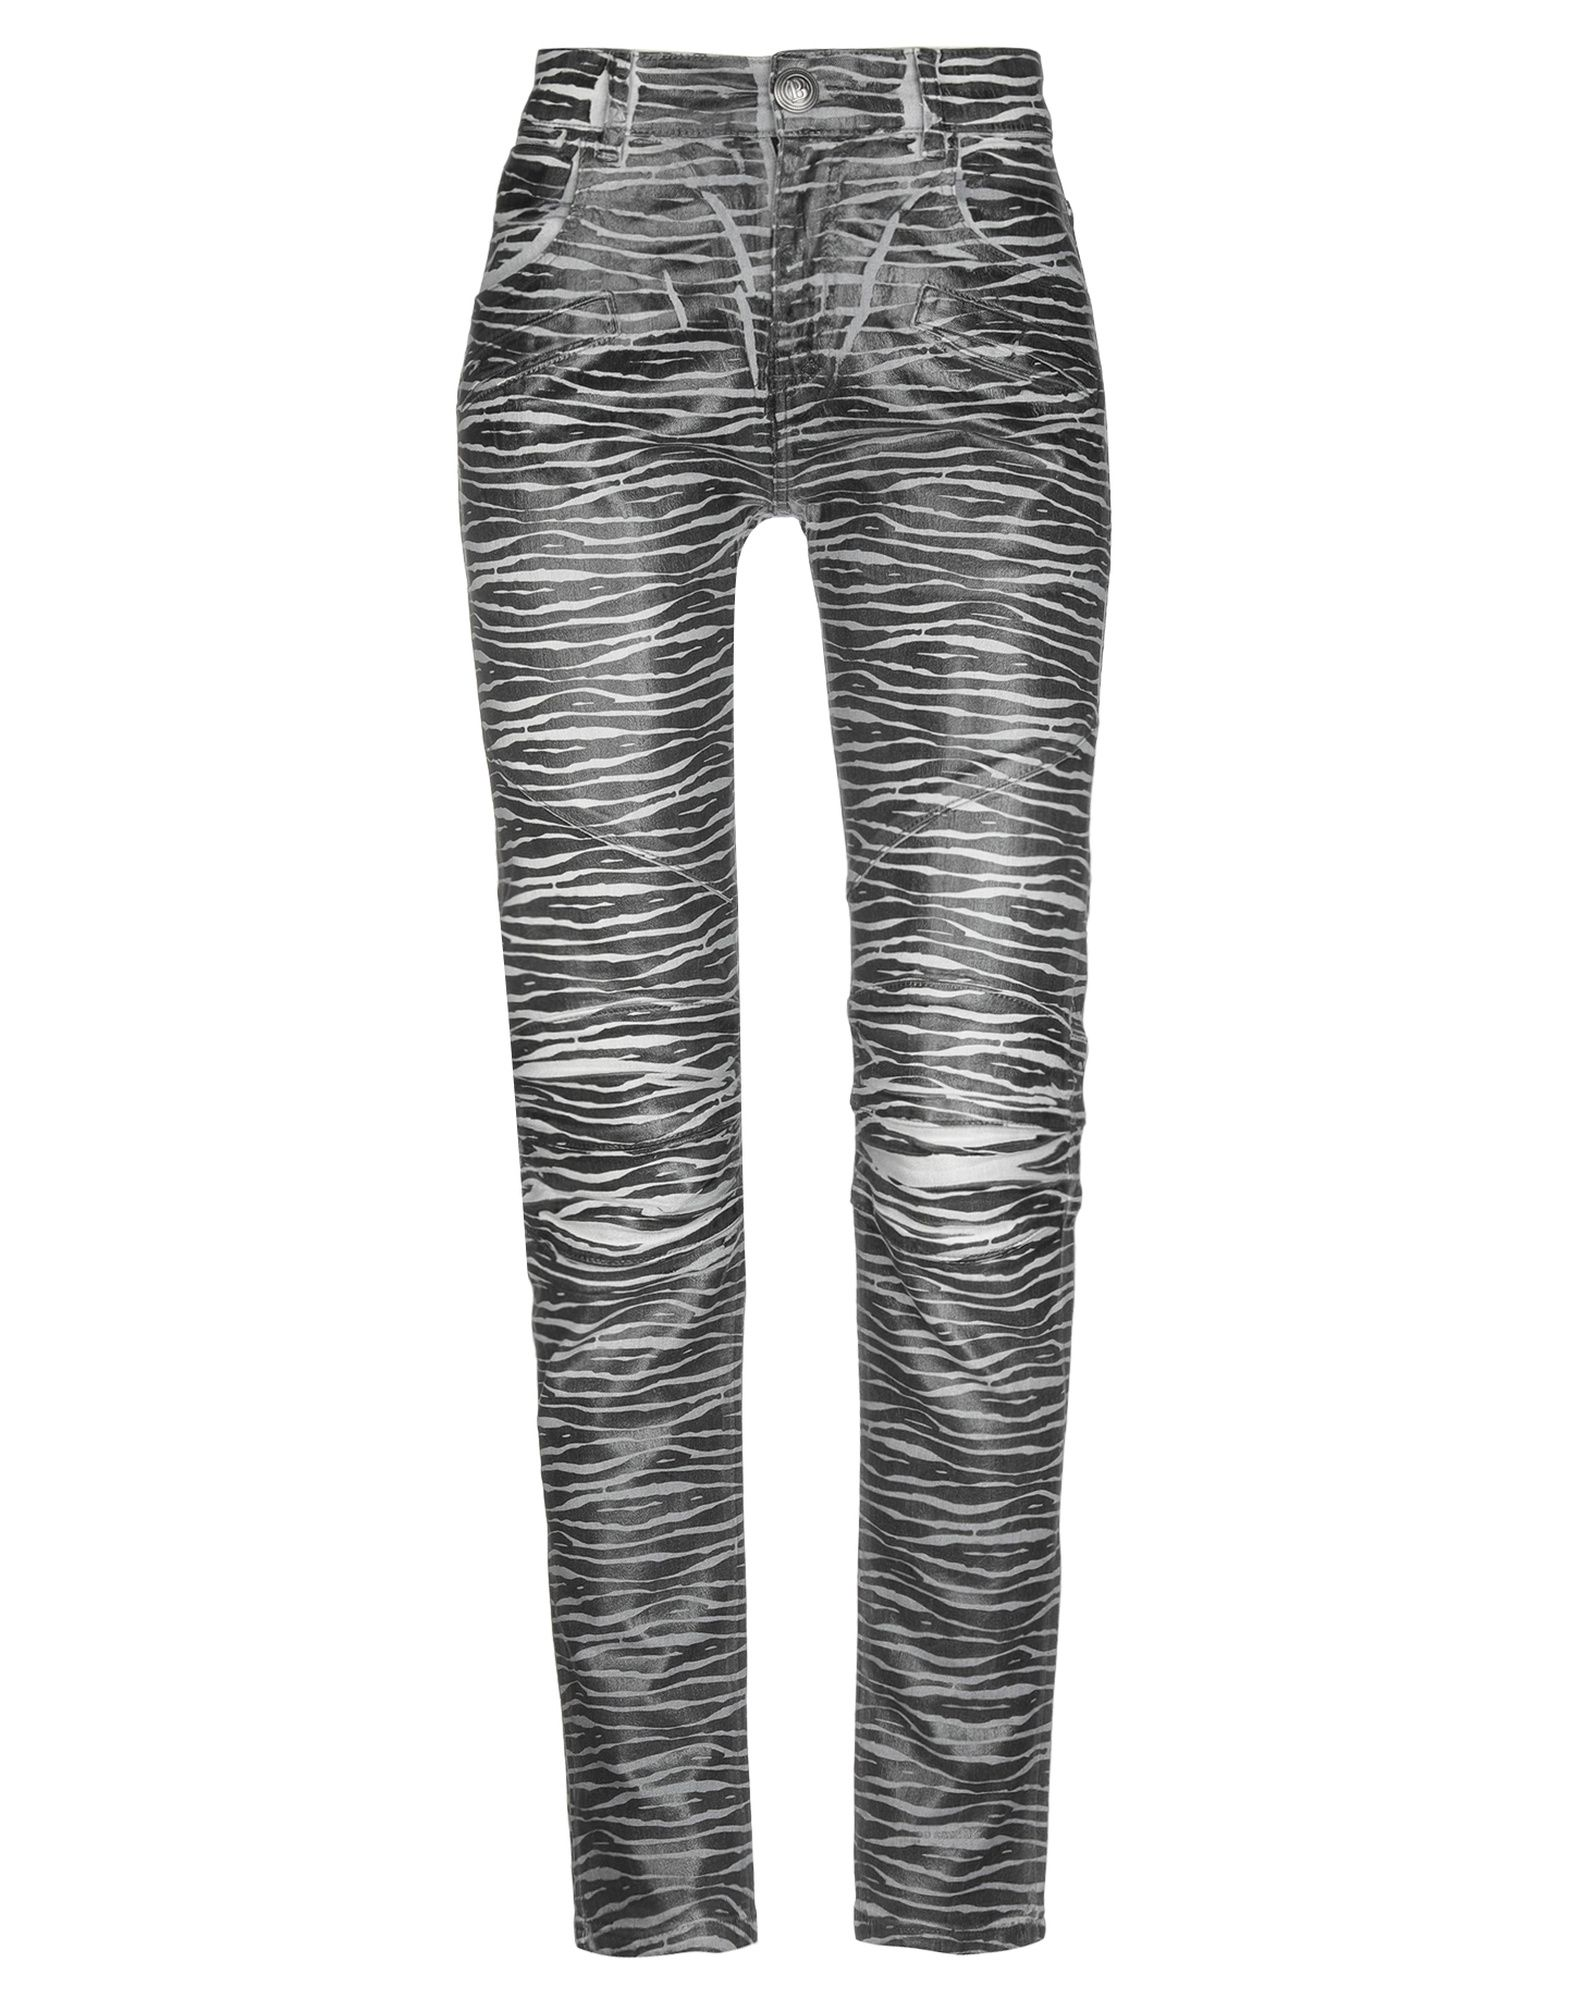 PIERRE BALMAIN Denim pants - Item 42726874